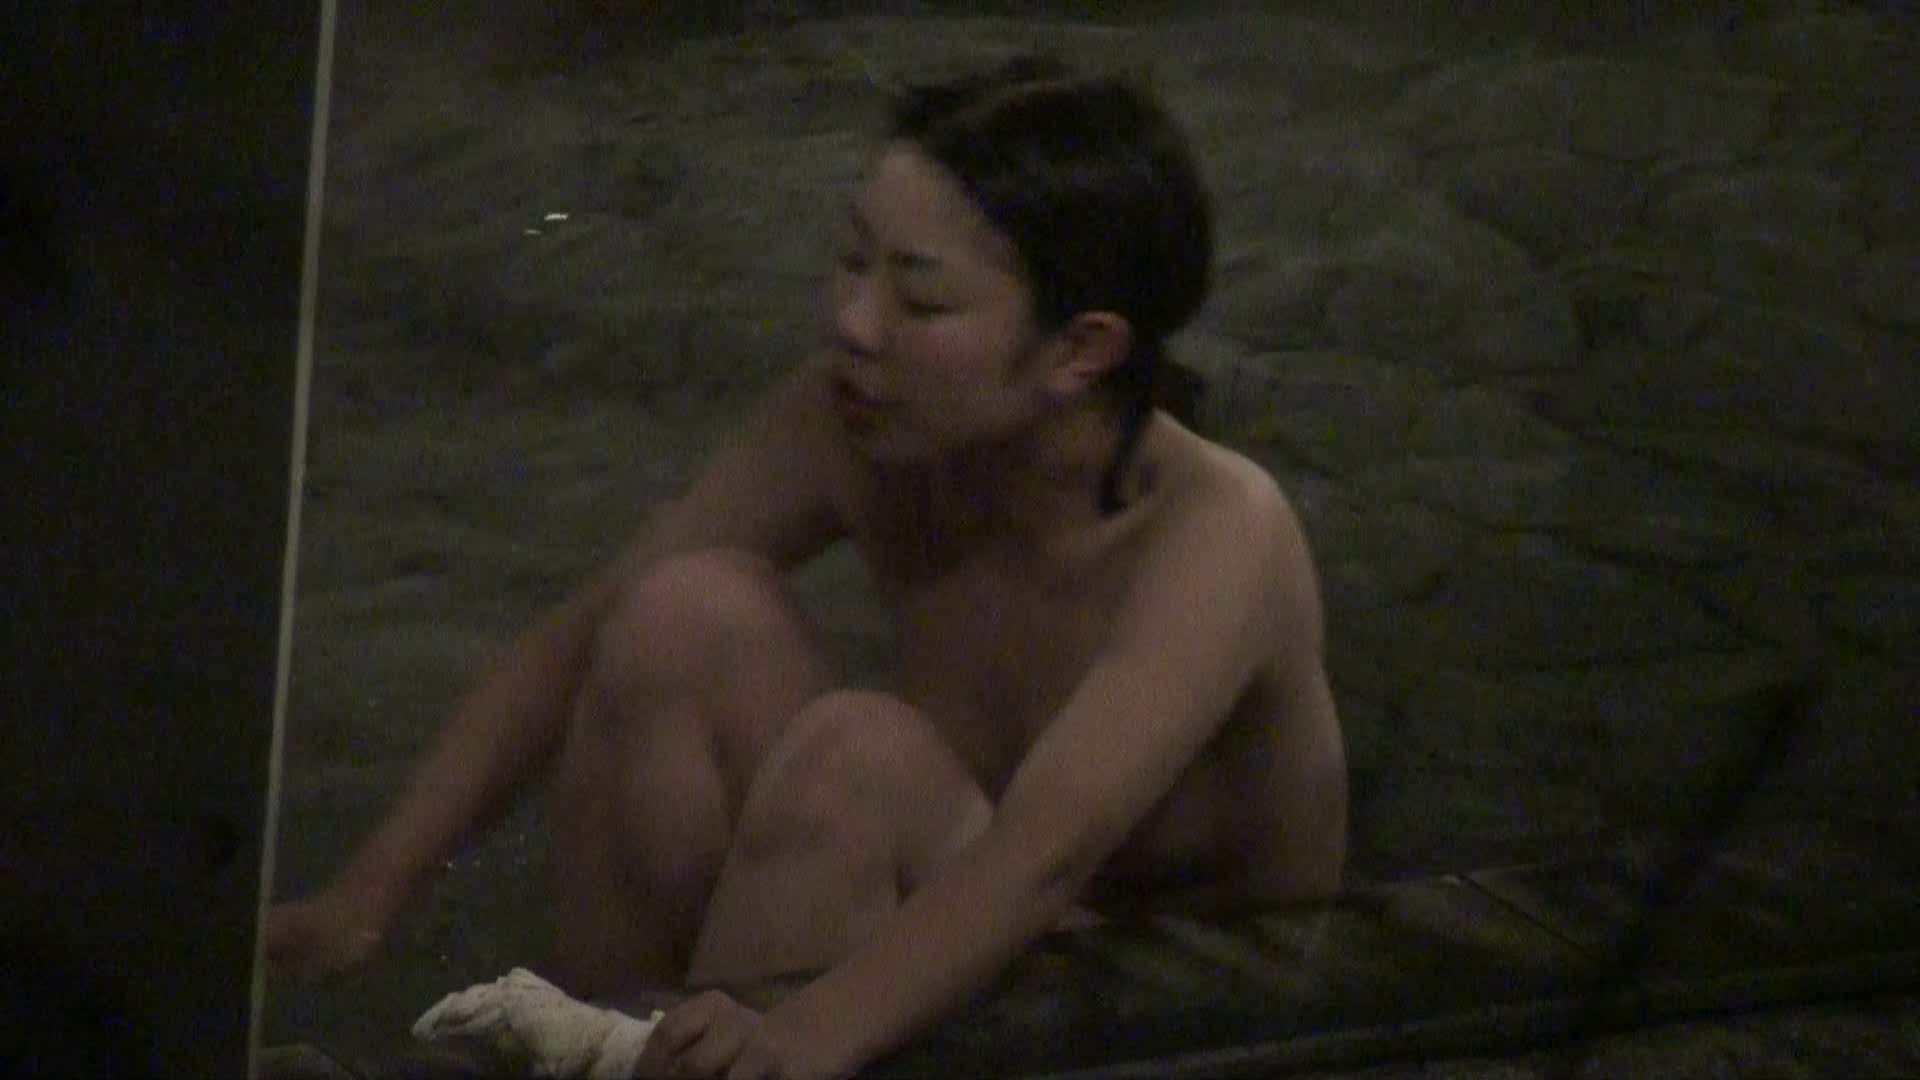 Aquaな露天風呂Vol.330 盗撮 | OLセックス  106画像 7